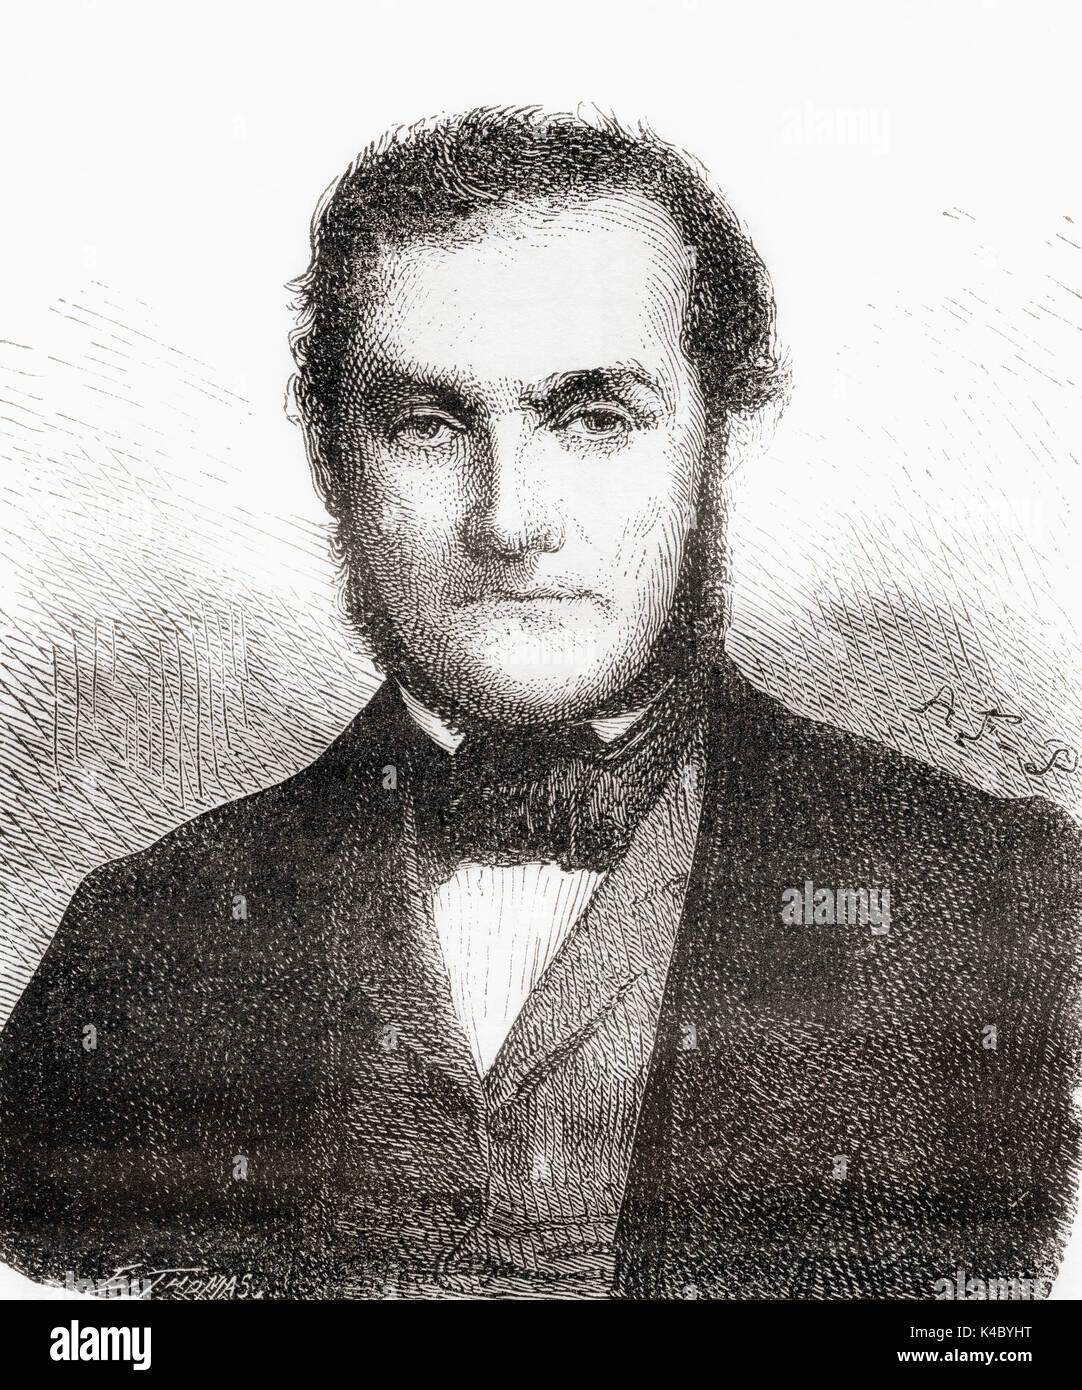 Robert Wilhelm Eberhard Bunsen, 1811 - 1899.  German chemist.   From Les Merveilles de la Science, published 1870. - Stock Image